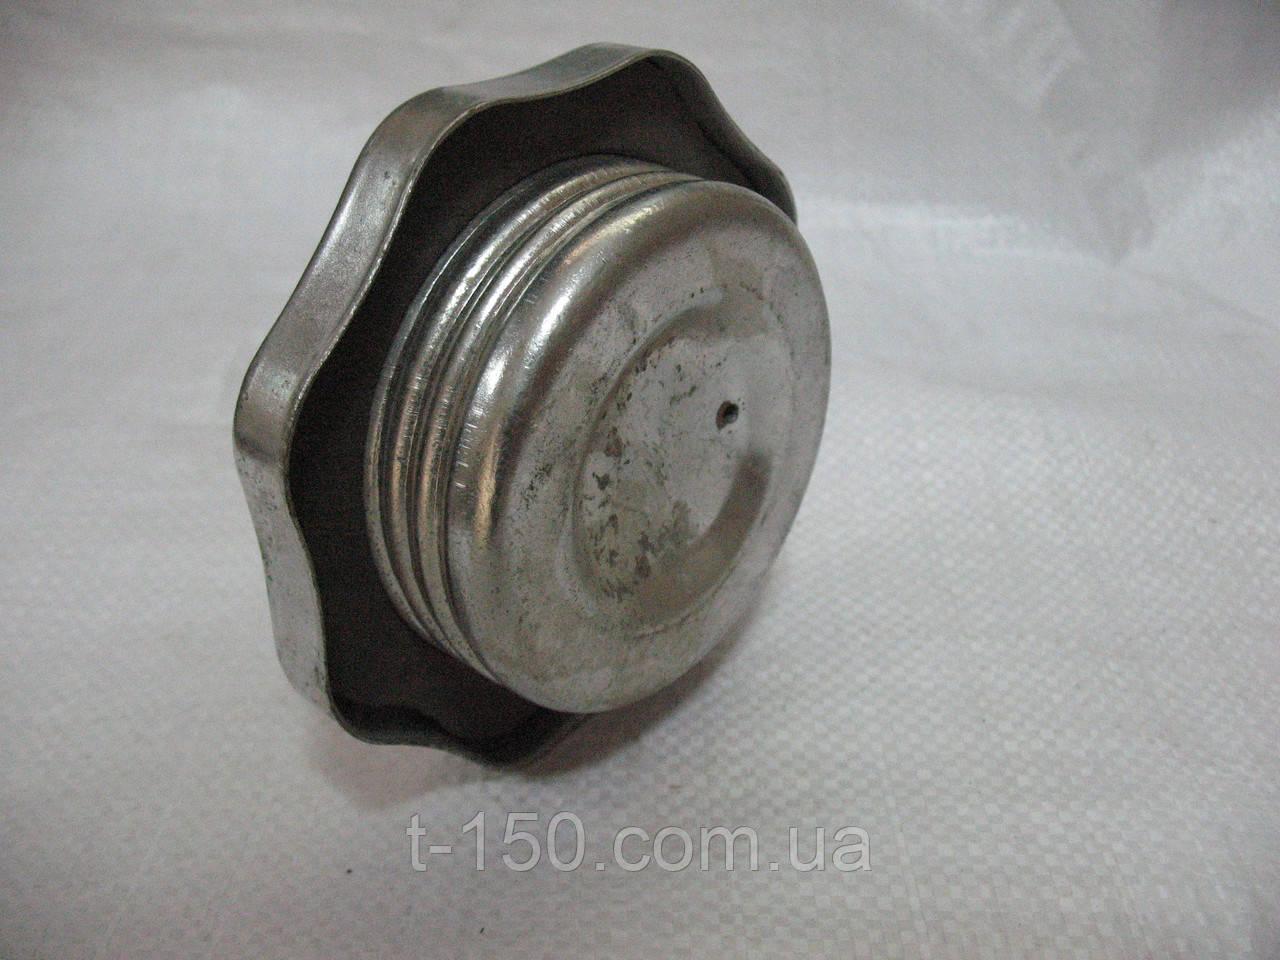 Крышка топливного бака Т-150, ЮМЗ (метал.) (74.50.042-4)